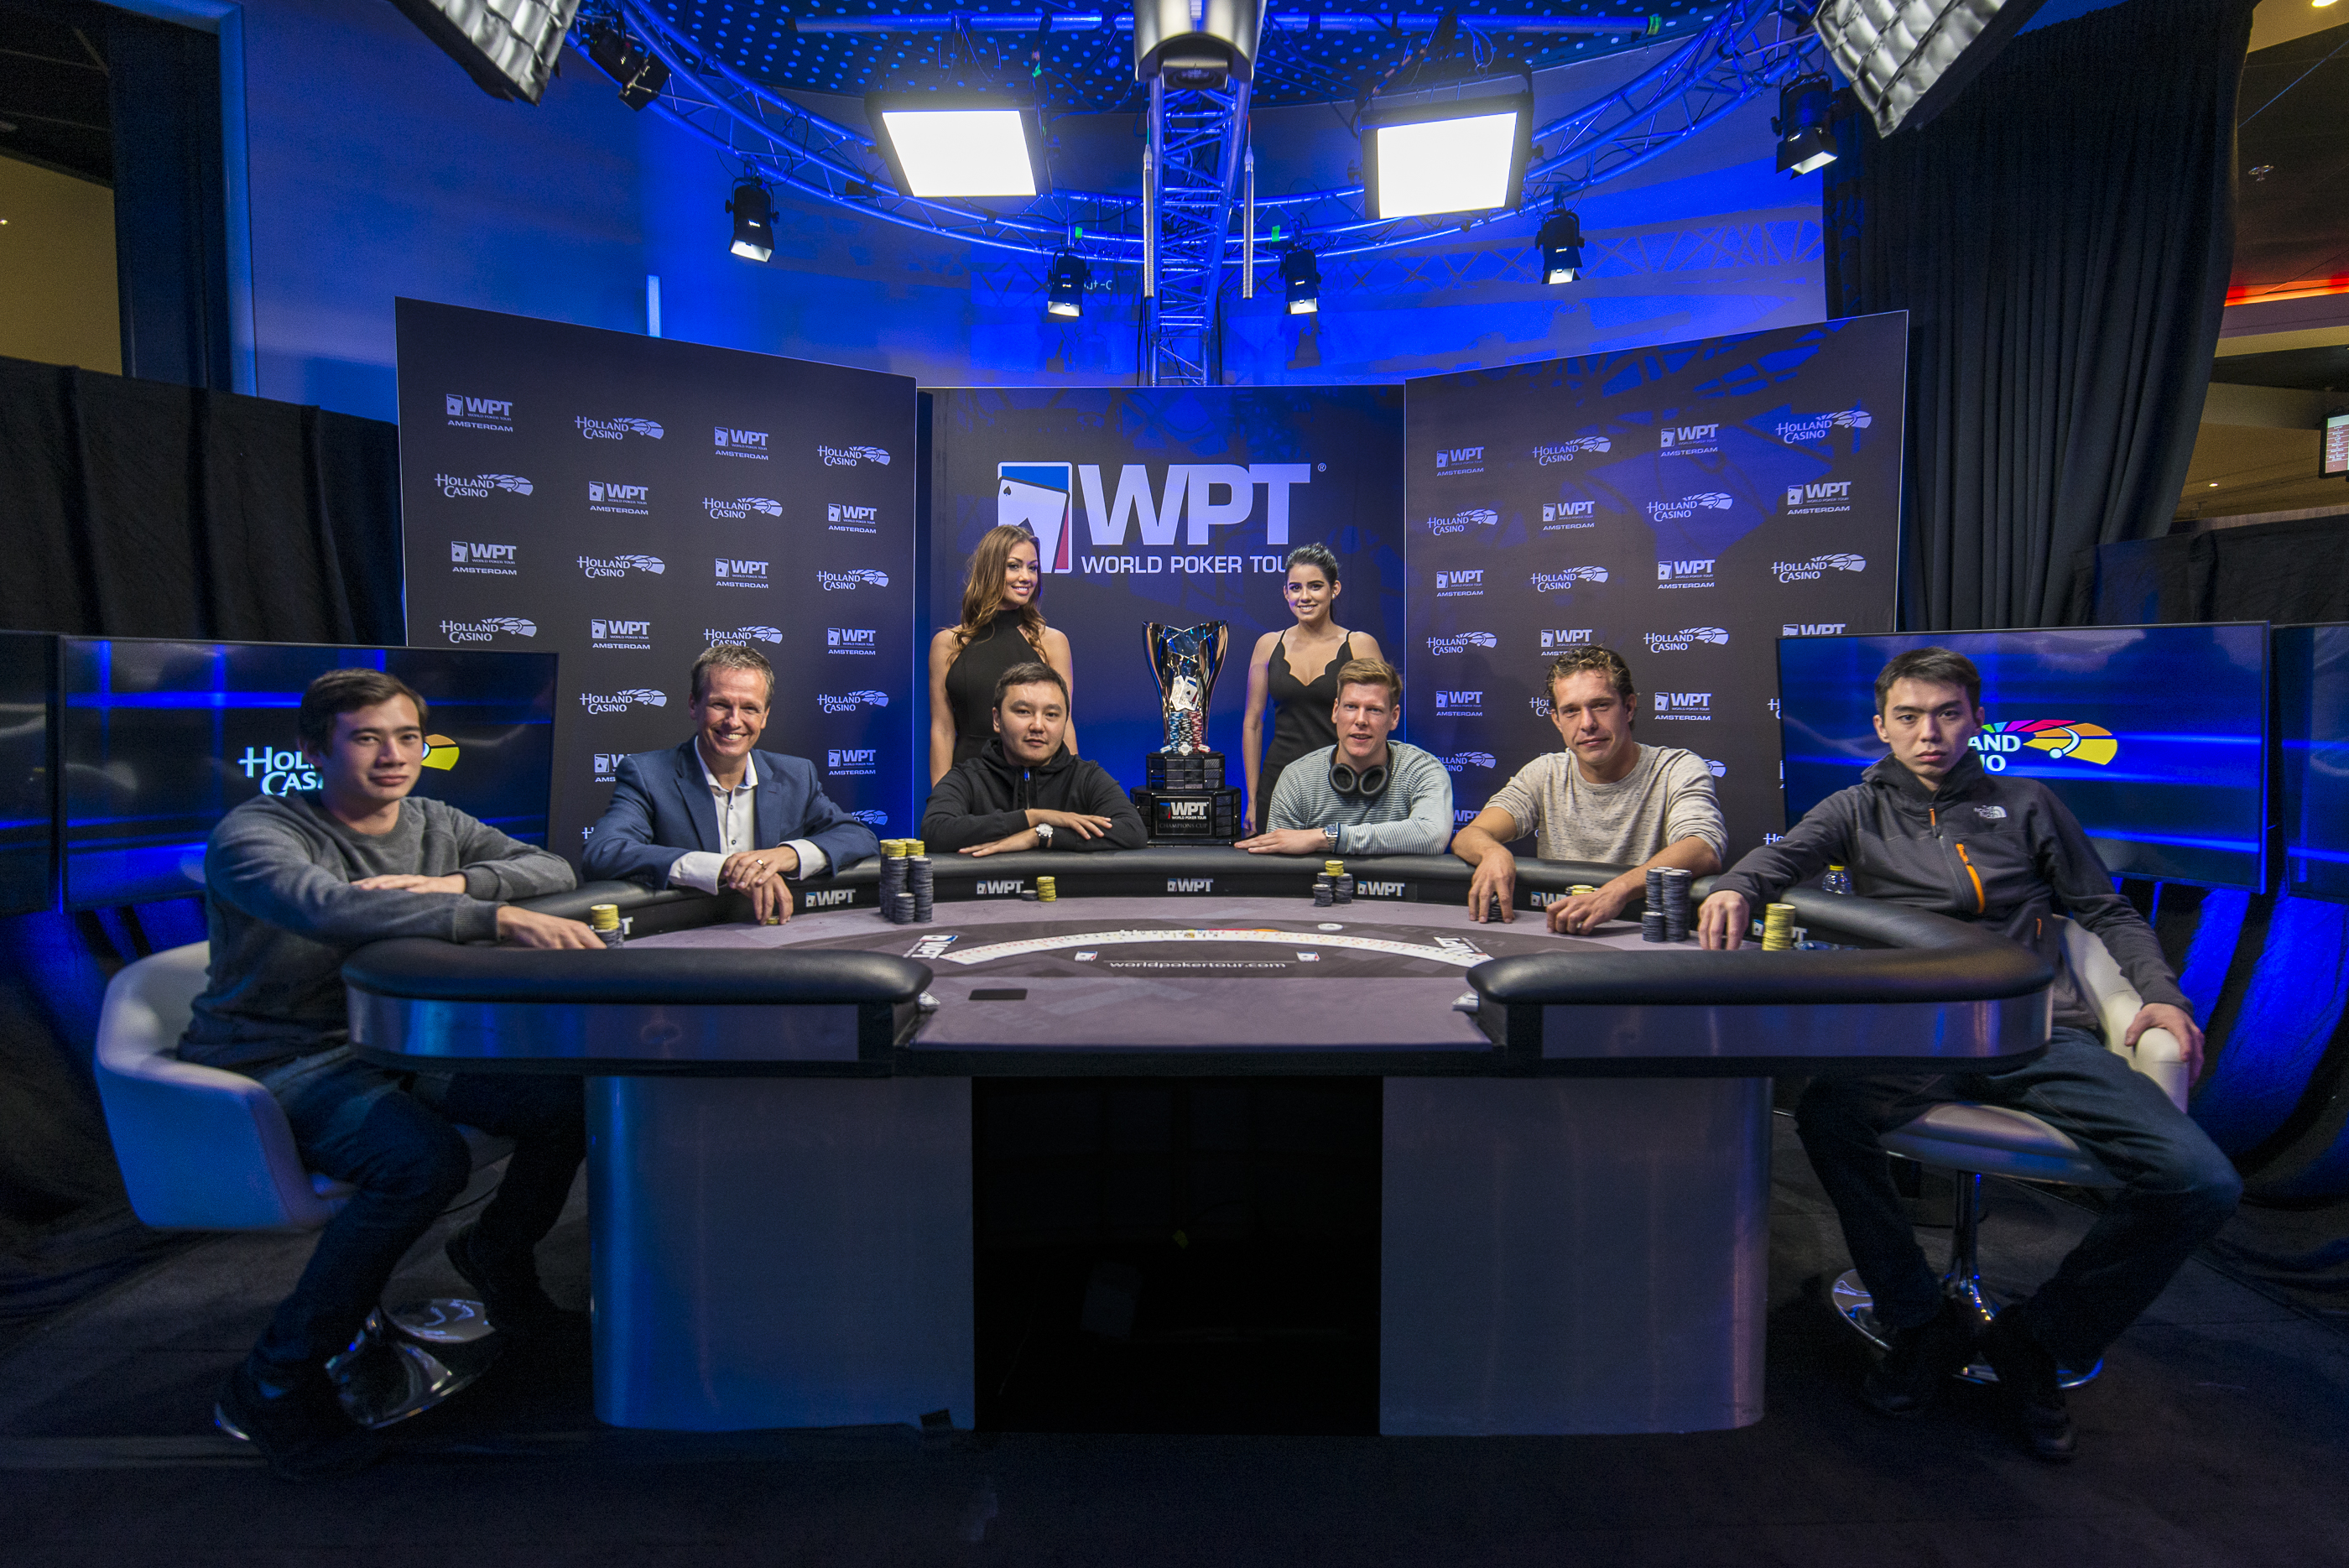 WPT Amsterdam - Daniel Daniyar wint Main Event voor €152.600, Wetemans wint €1k Hyper 101